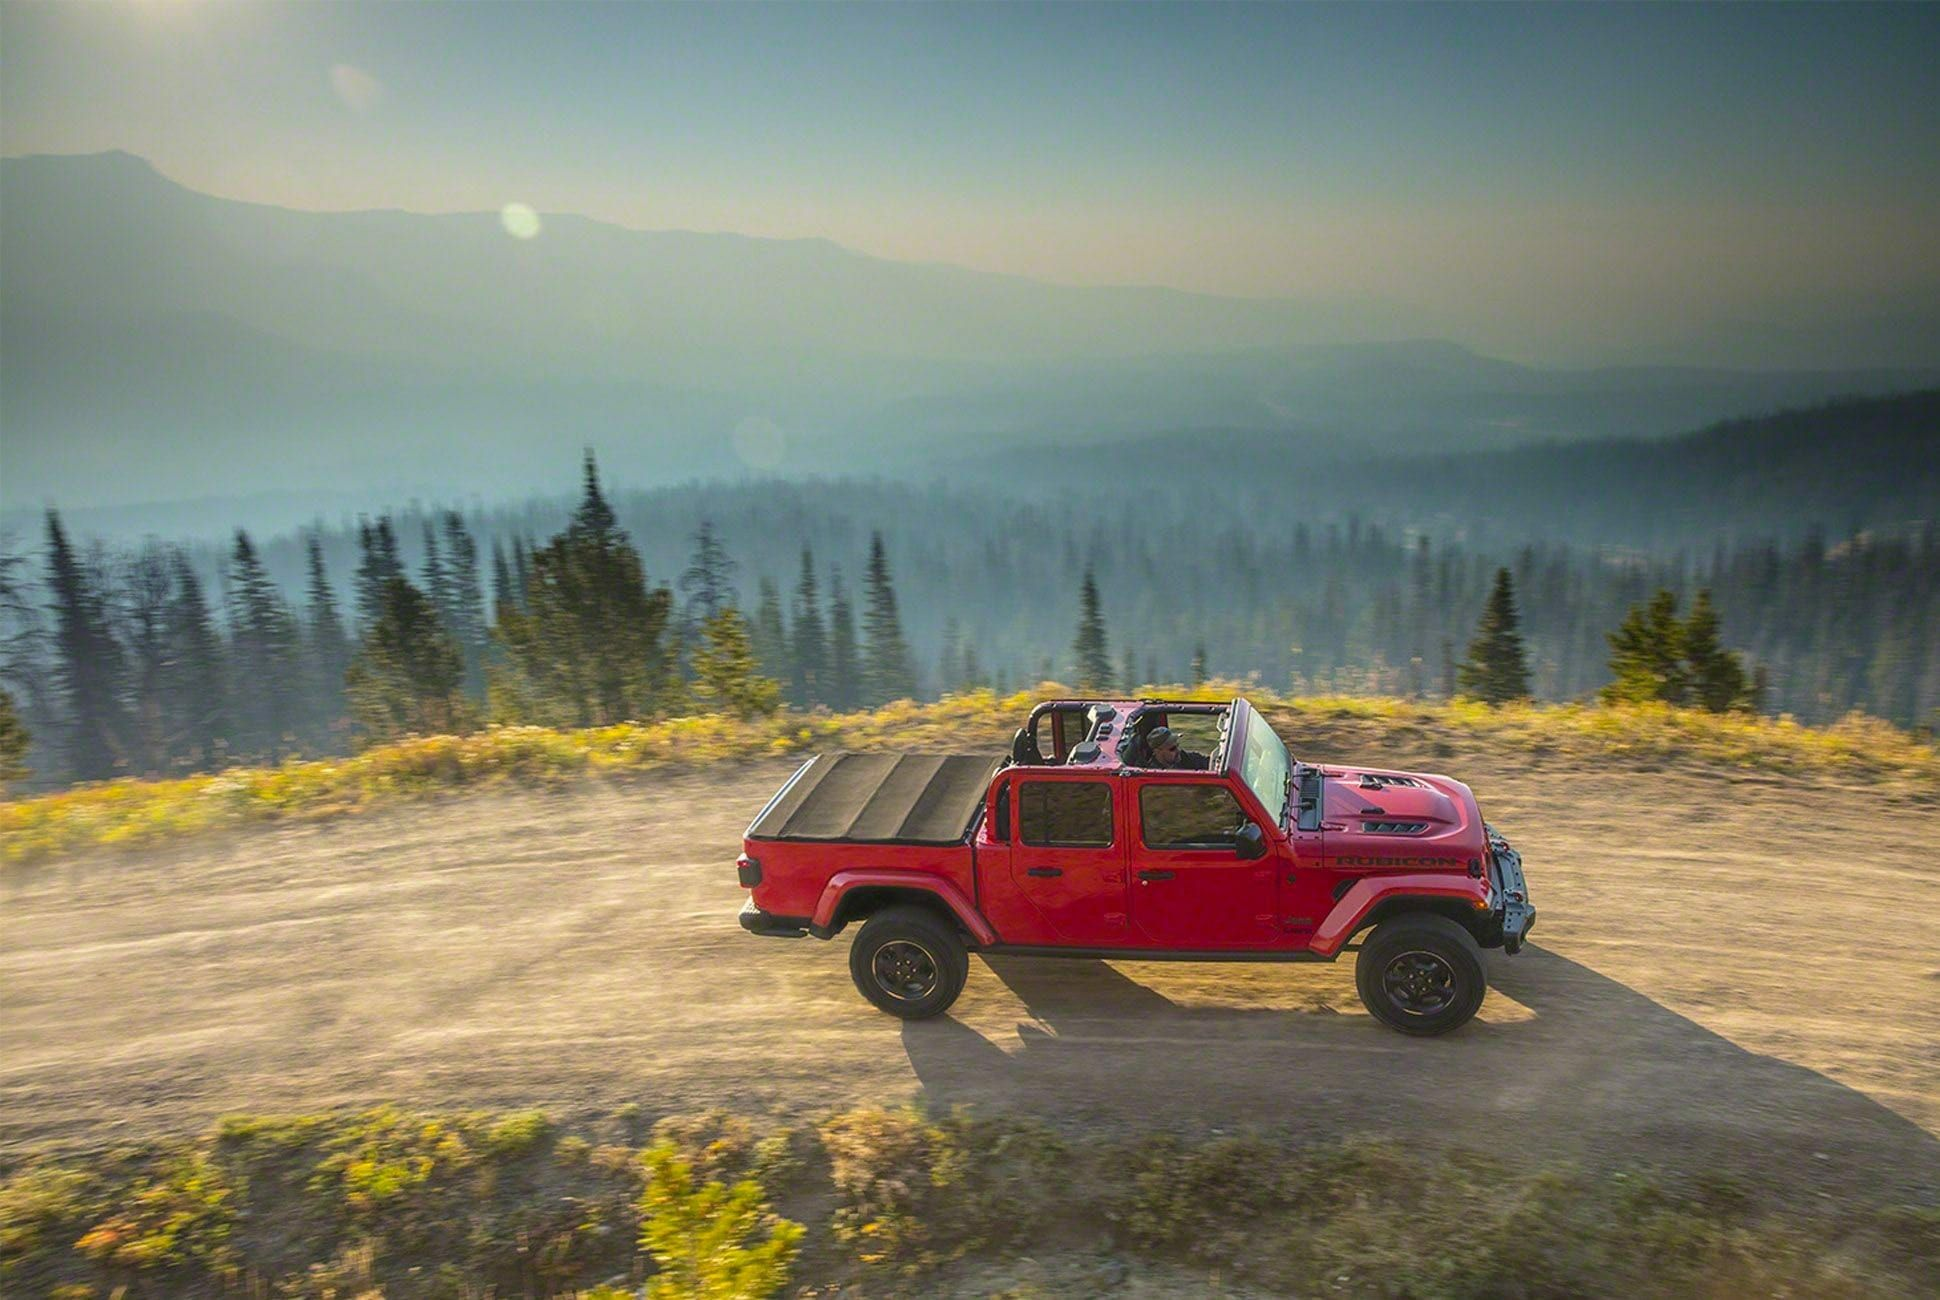 2019-Jeep-Gladiator-gear-patrol-slide-4